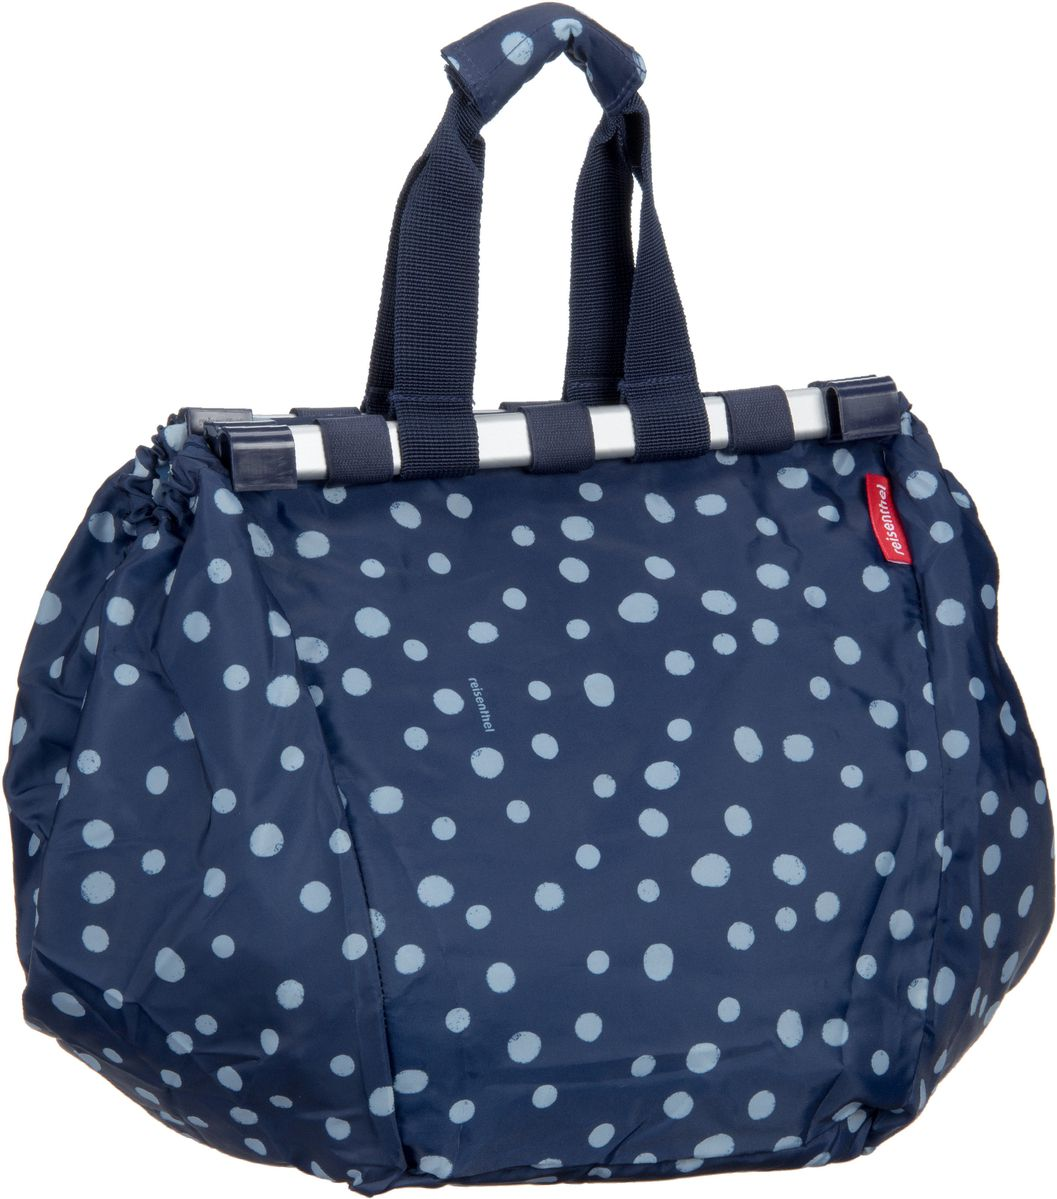 reisenthel easyshoppingbag Spots Navy - Einkauf...